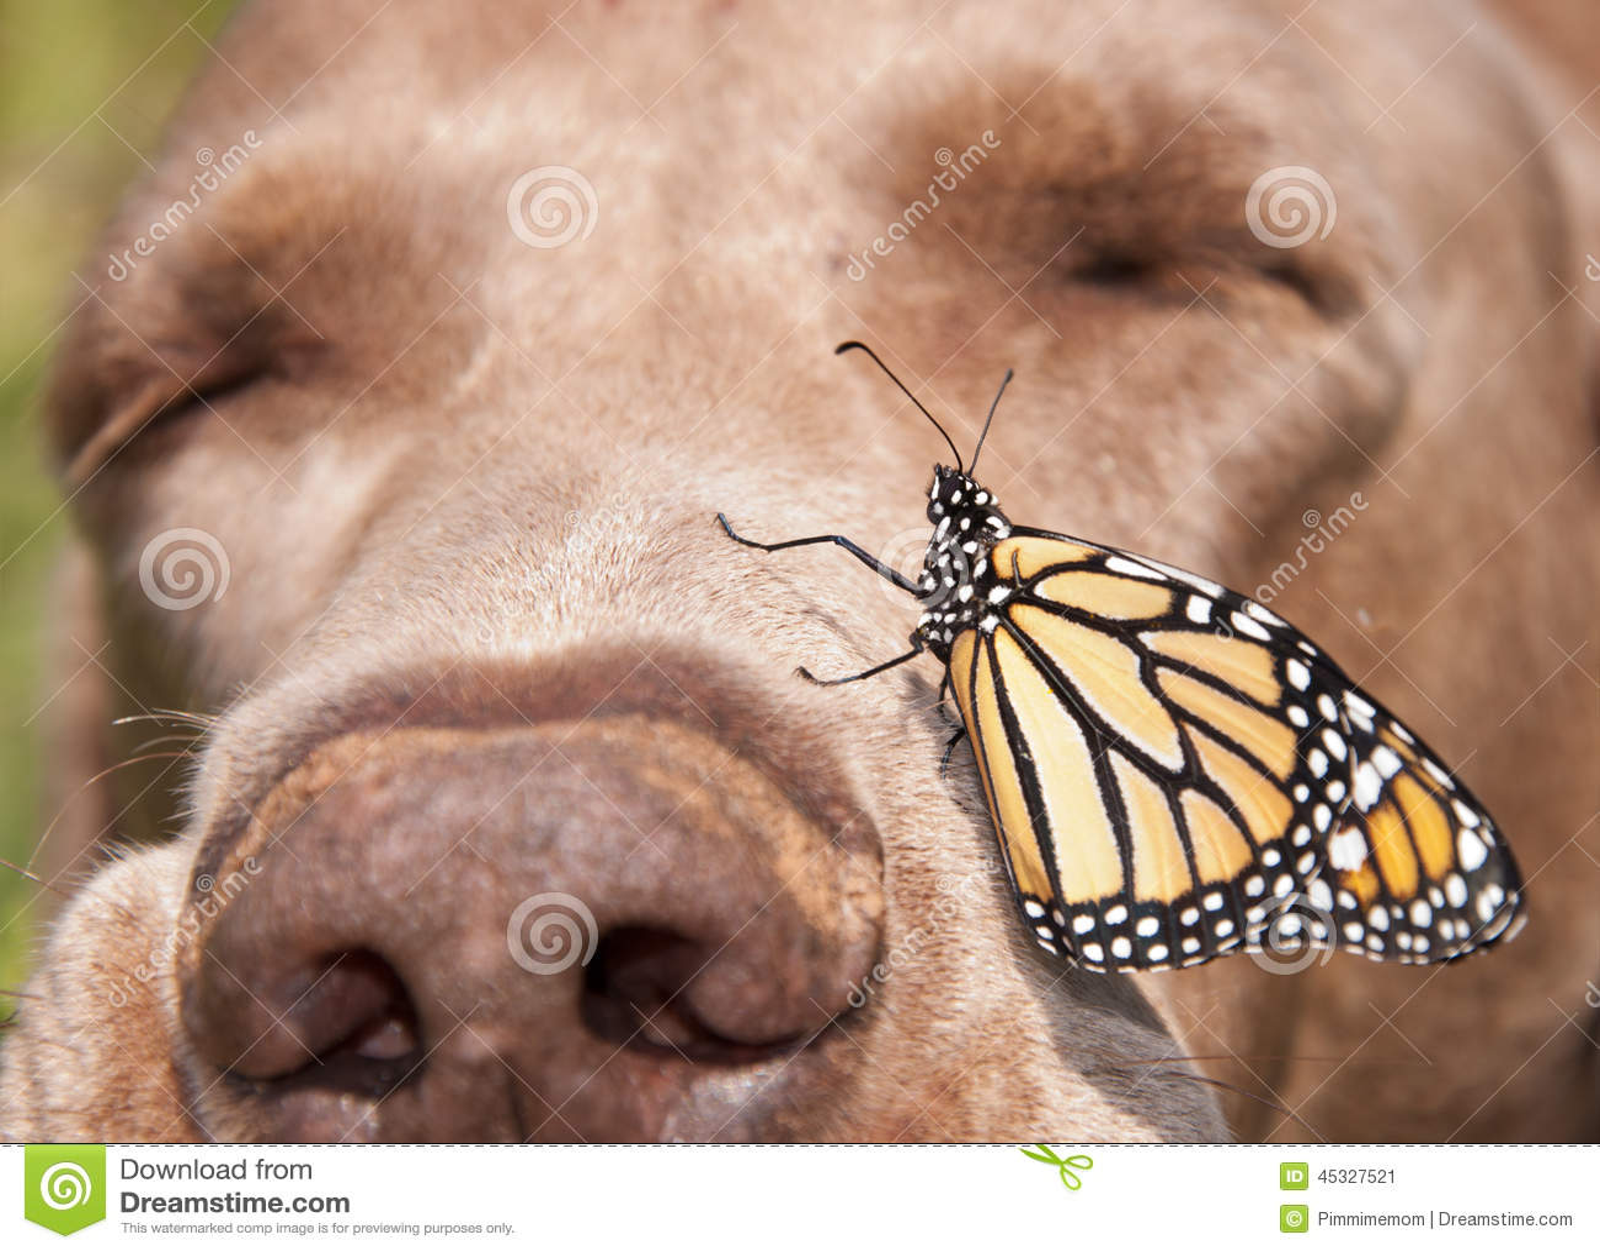 Бабочка монарха садилась на насест на стороне носа собаки